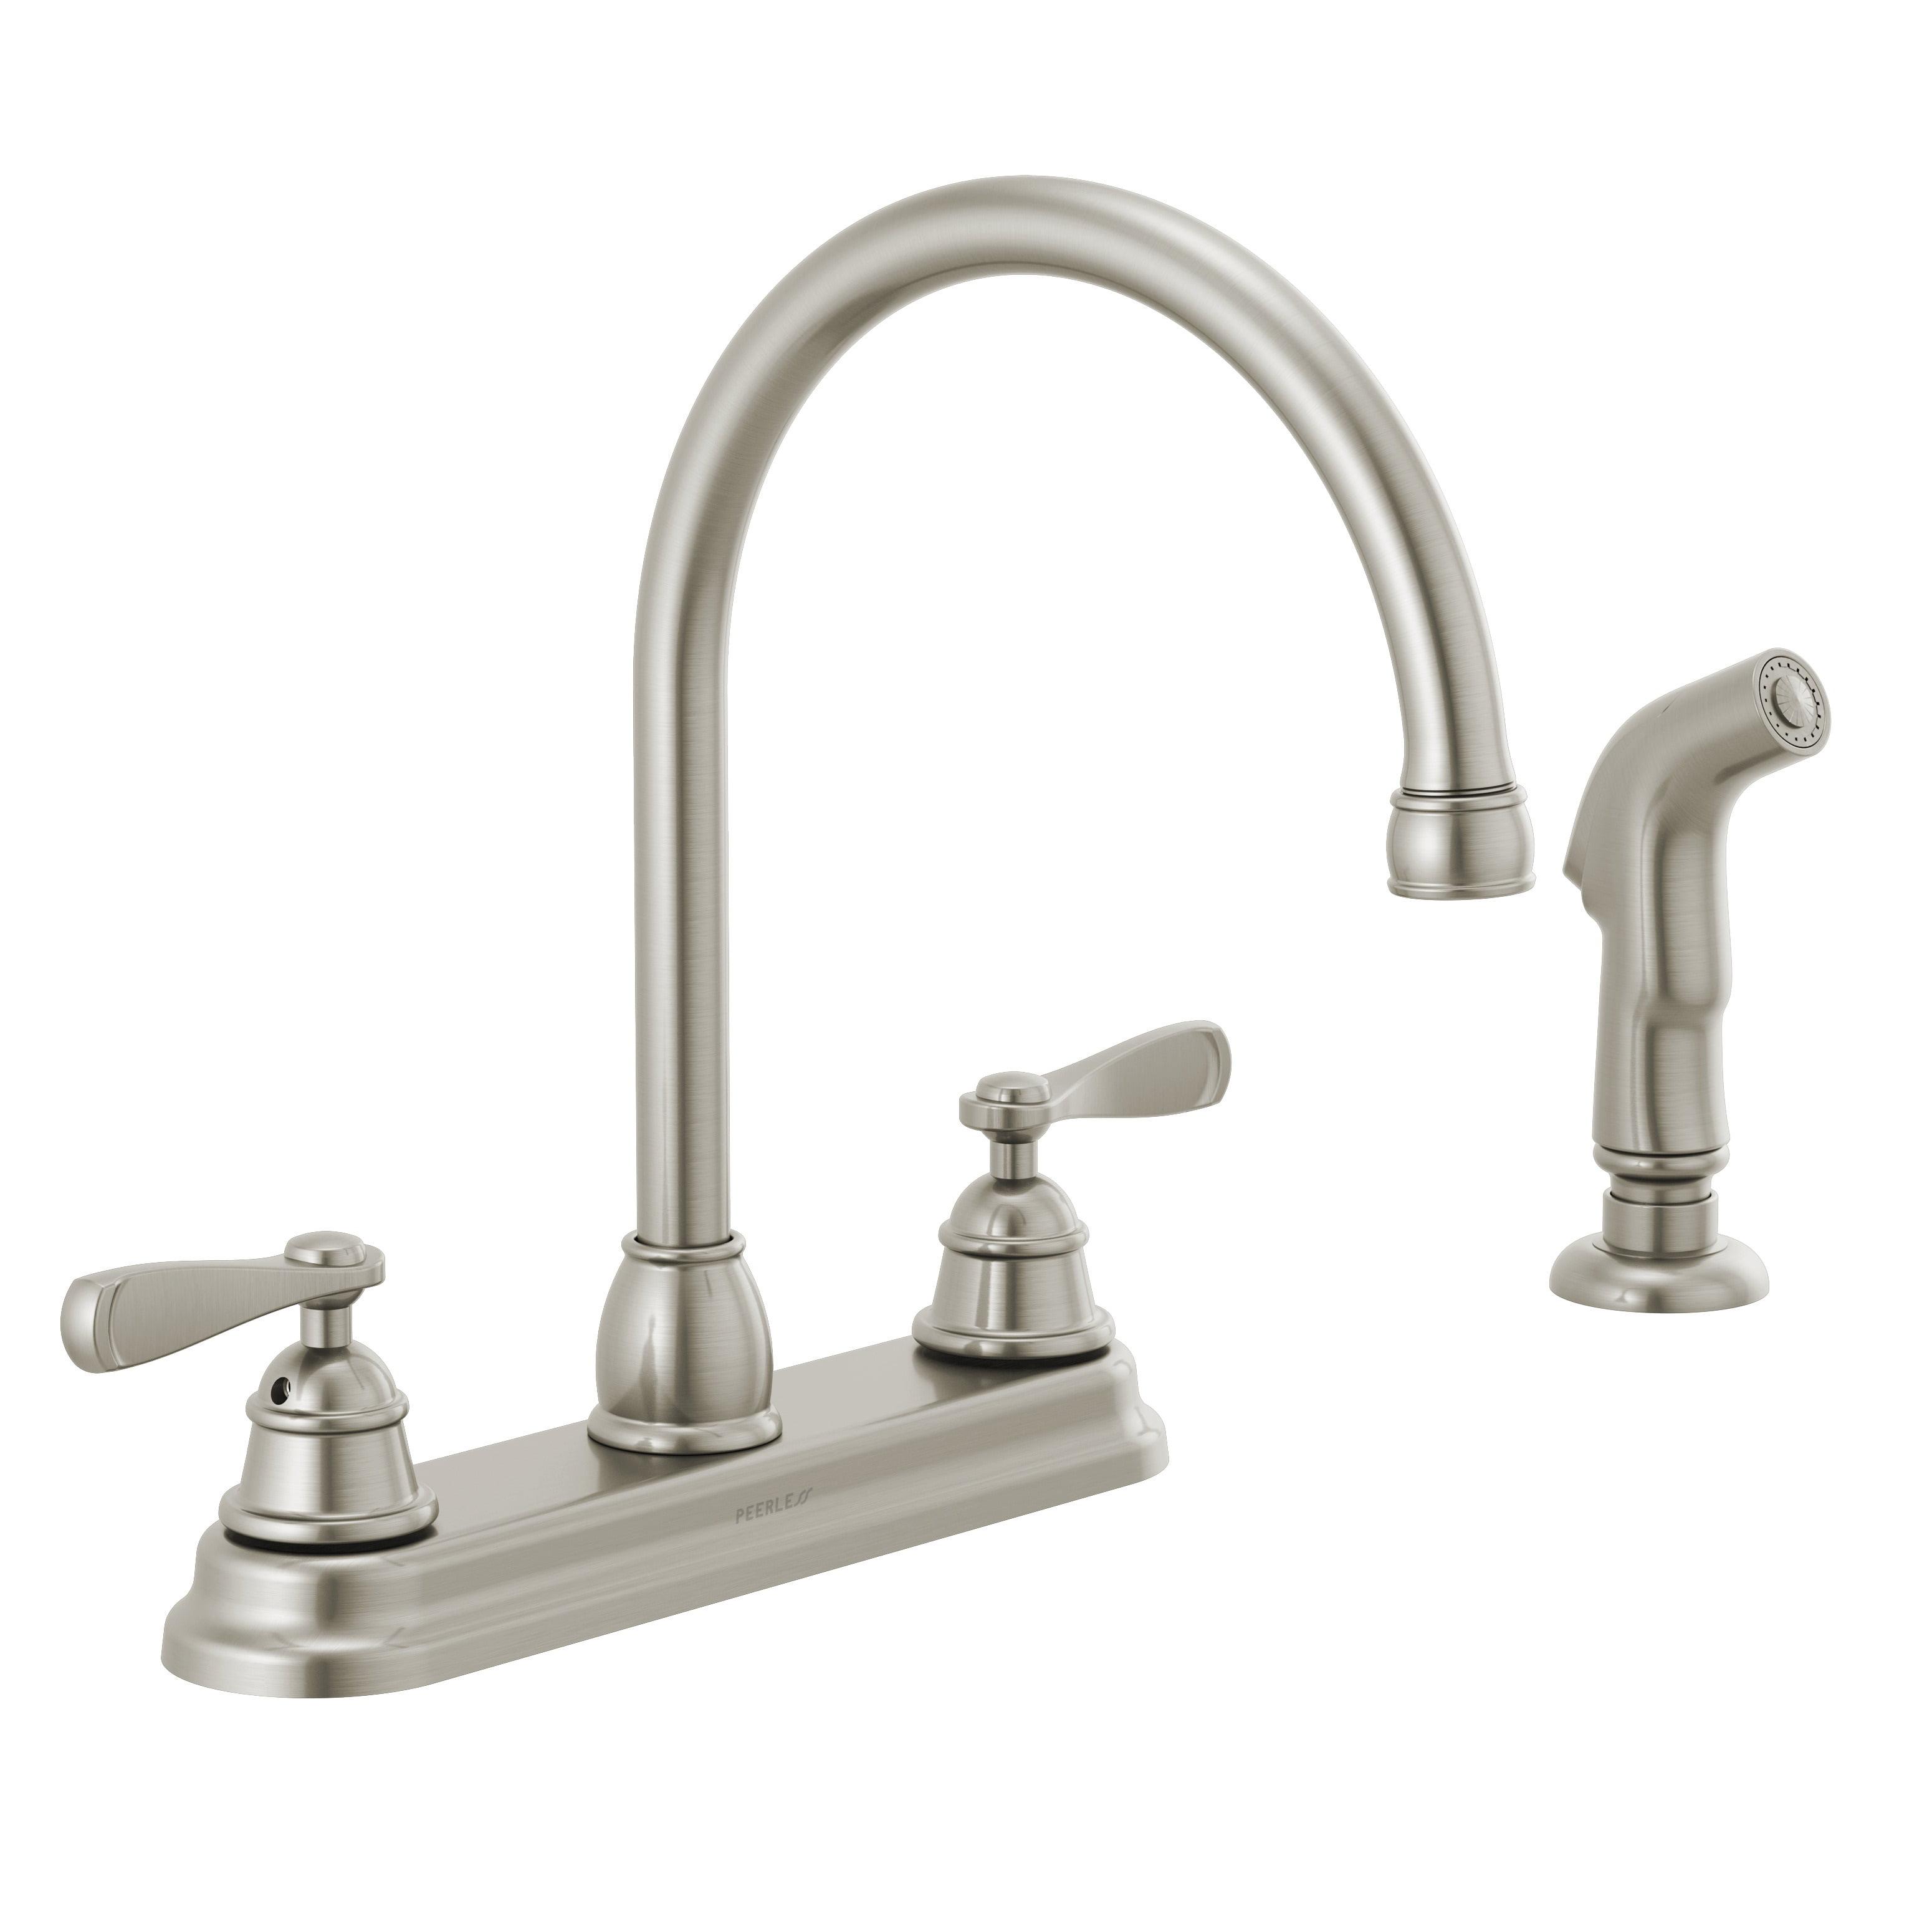 Peerless Two Handle Deck Mount Kitchen Faucet In Stainless Walmart Com Walmart Com